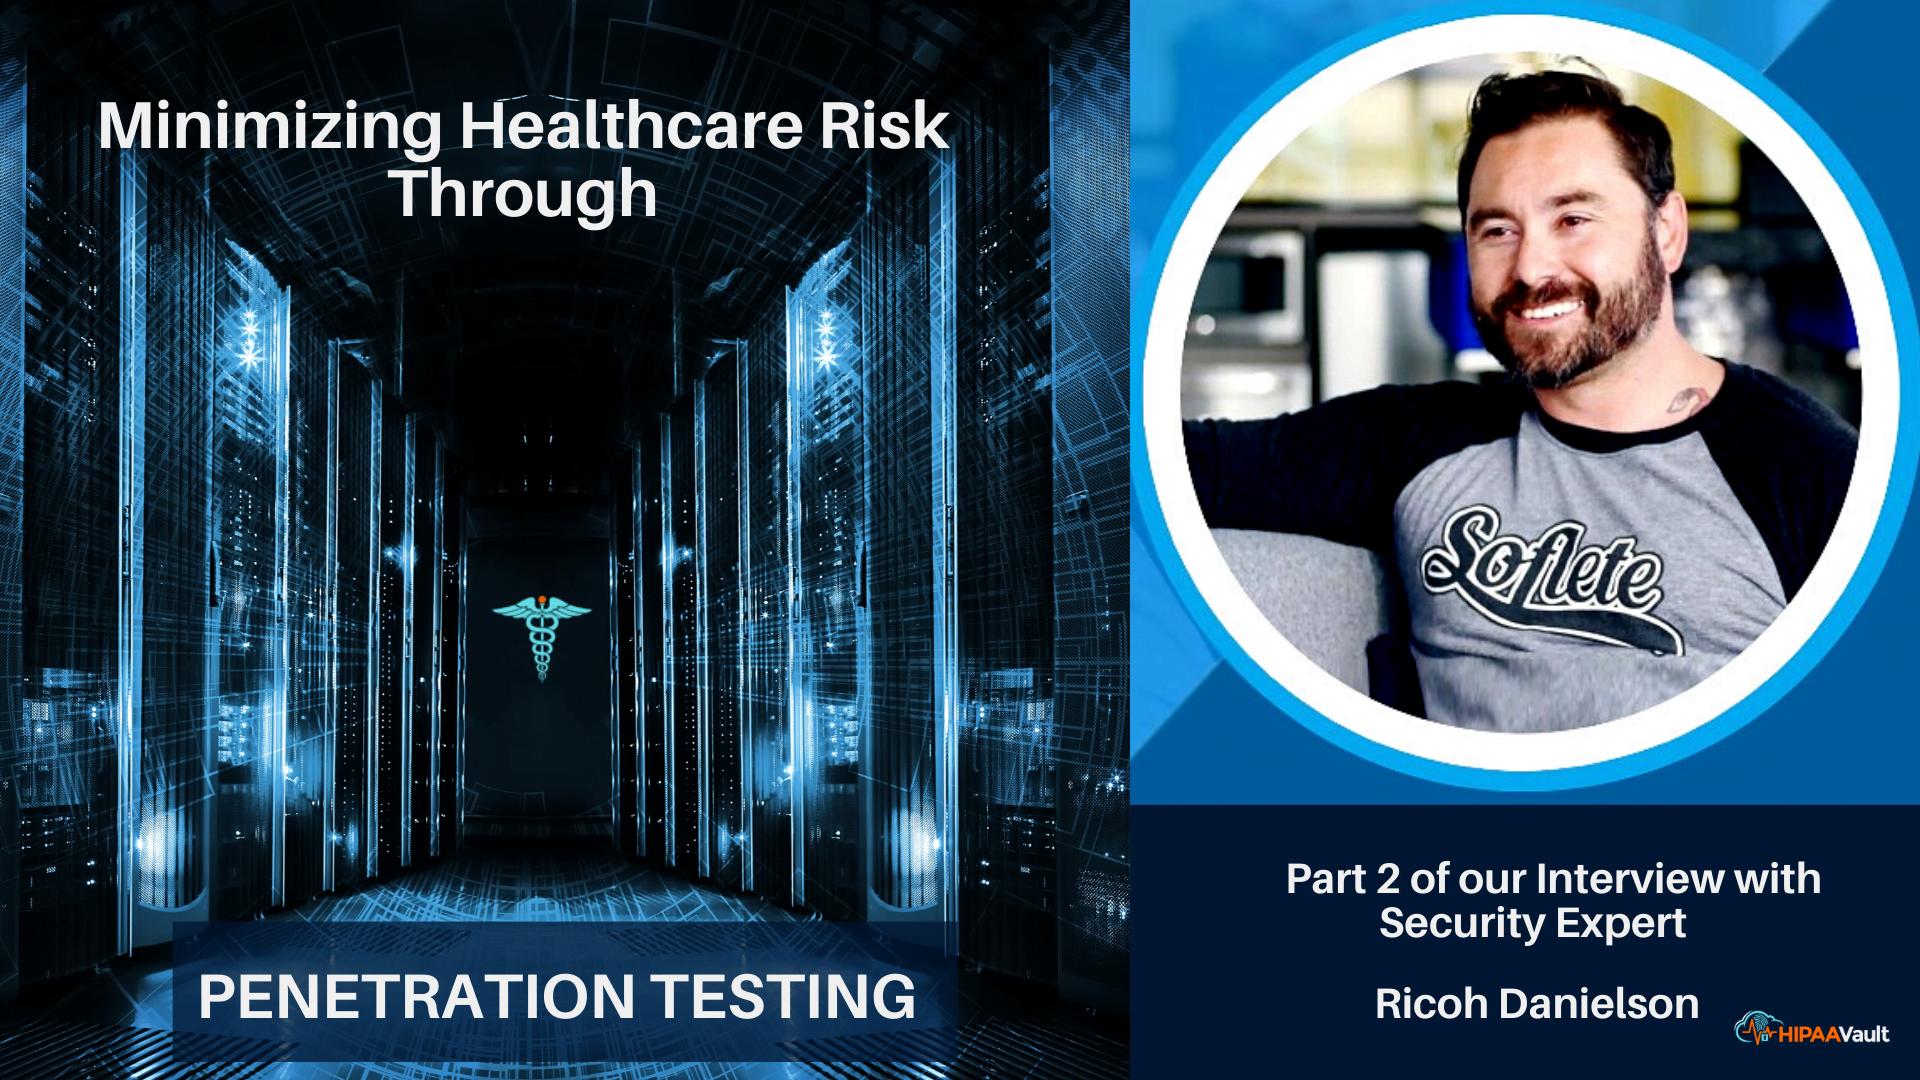 Minimizing Healthcare Risk through Penetration Testing (Part 2)